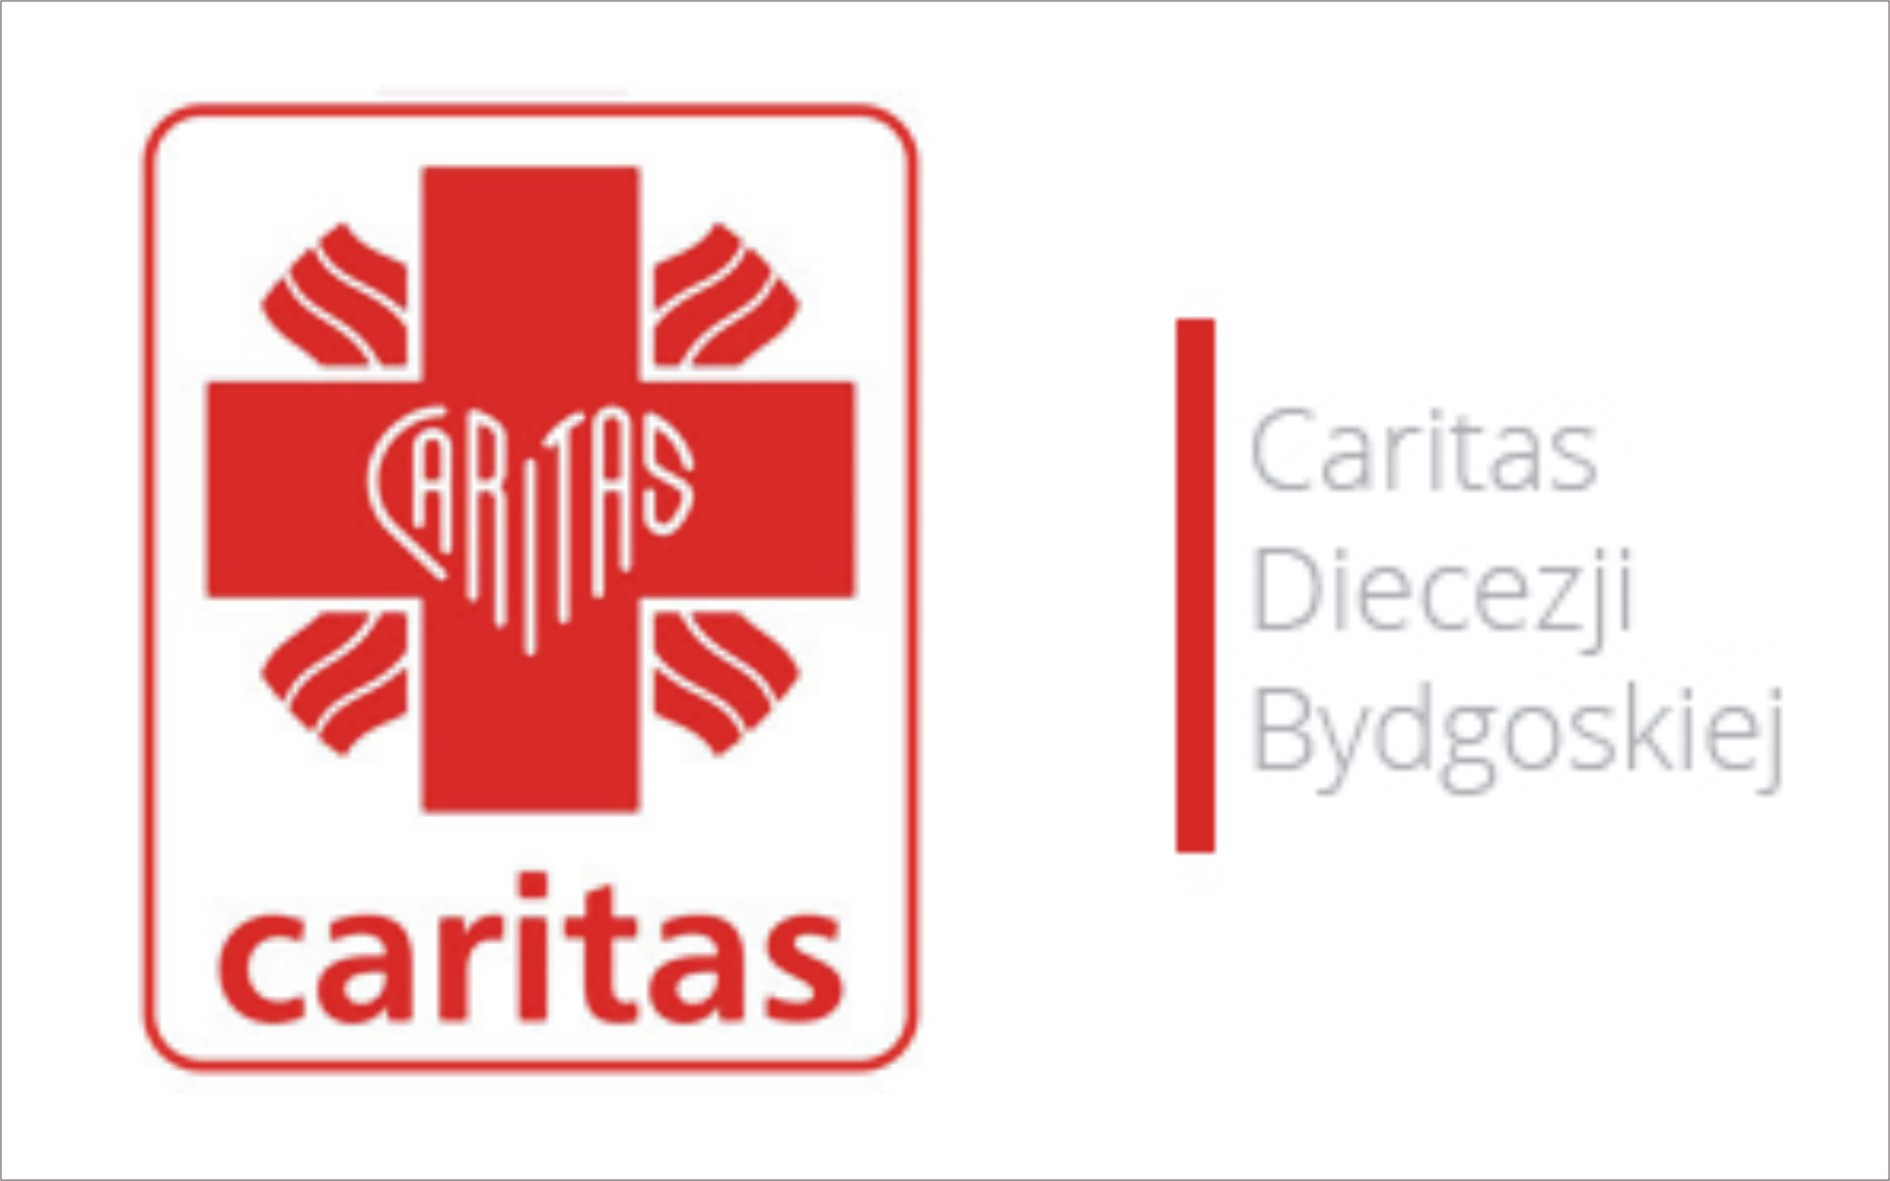 http://www.bydgoszcz.caritas.pl/